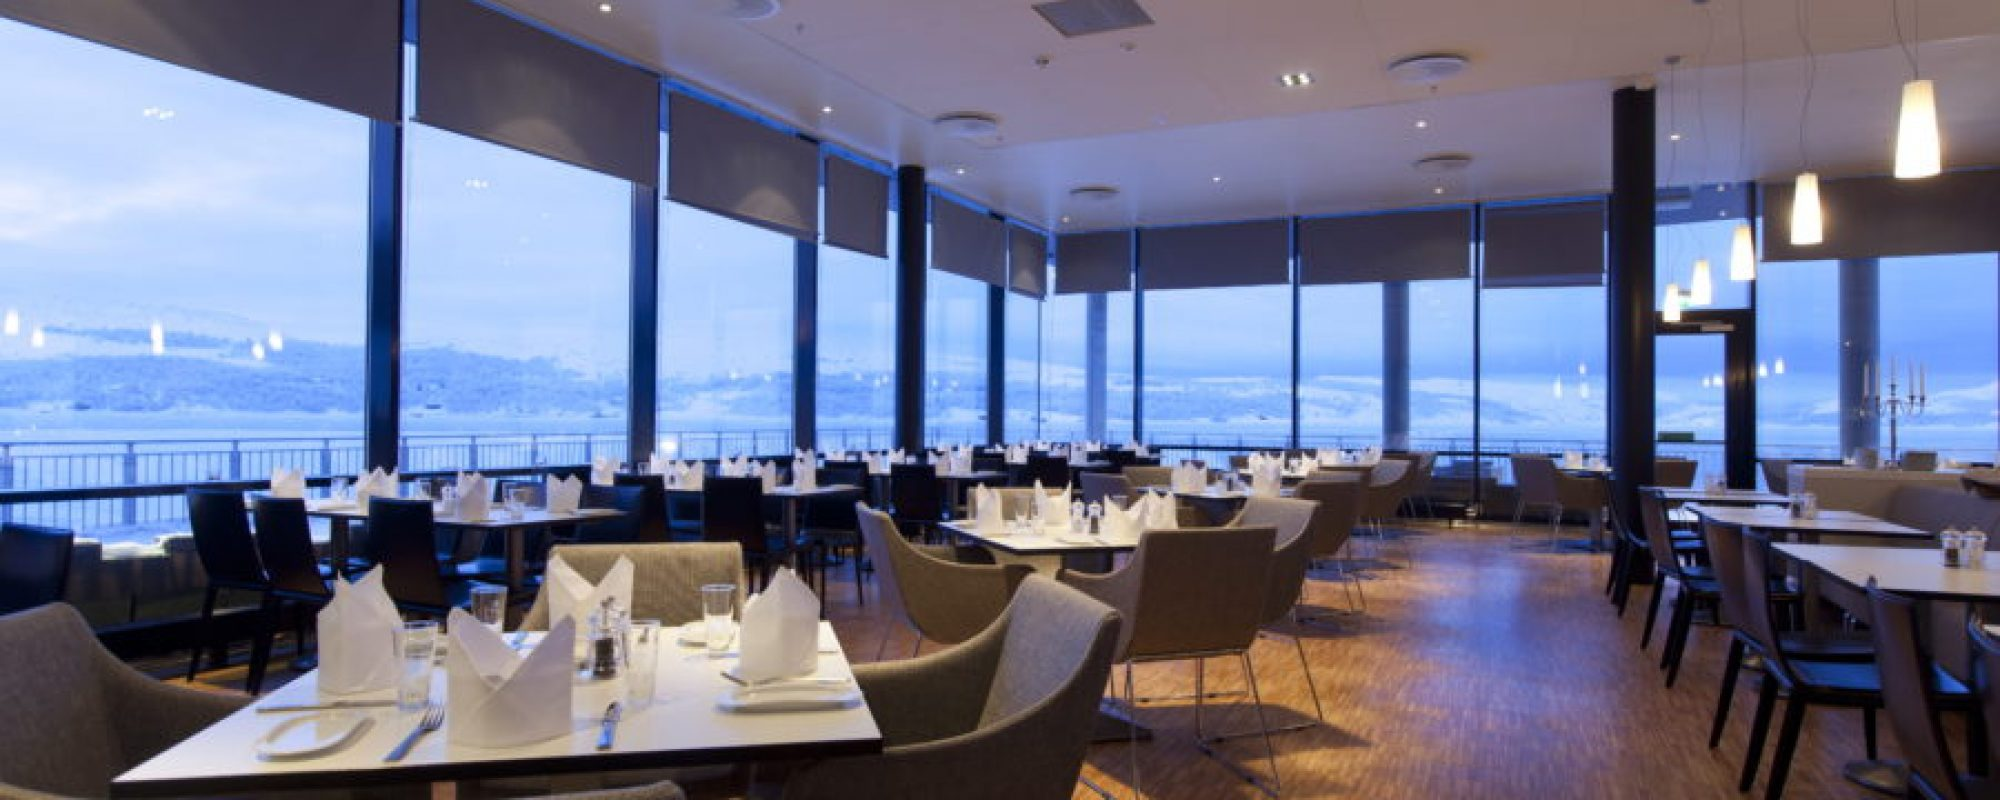 0-Thon-Hotel-Kirkenes-Restaurant-006